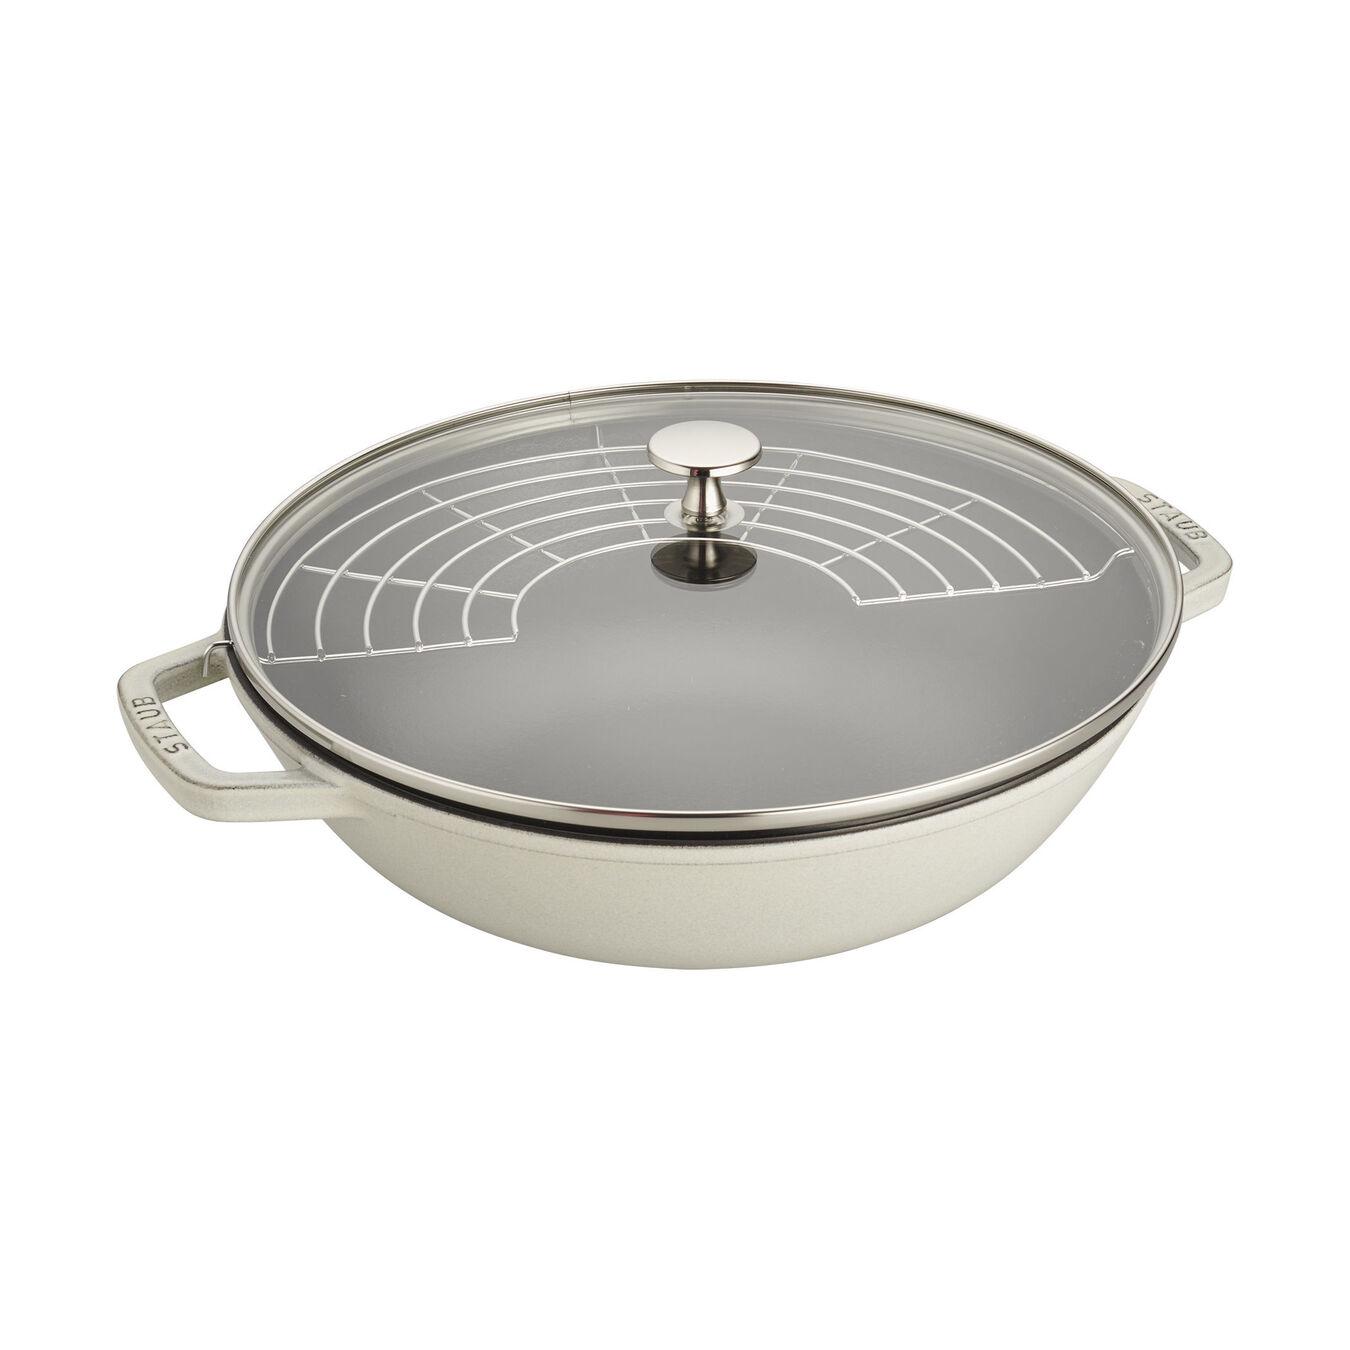 4.5-qt Perfect Pan - White Truffle,,large 1